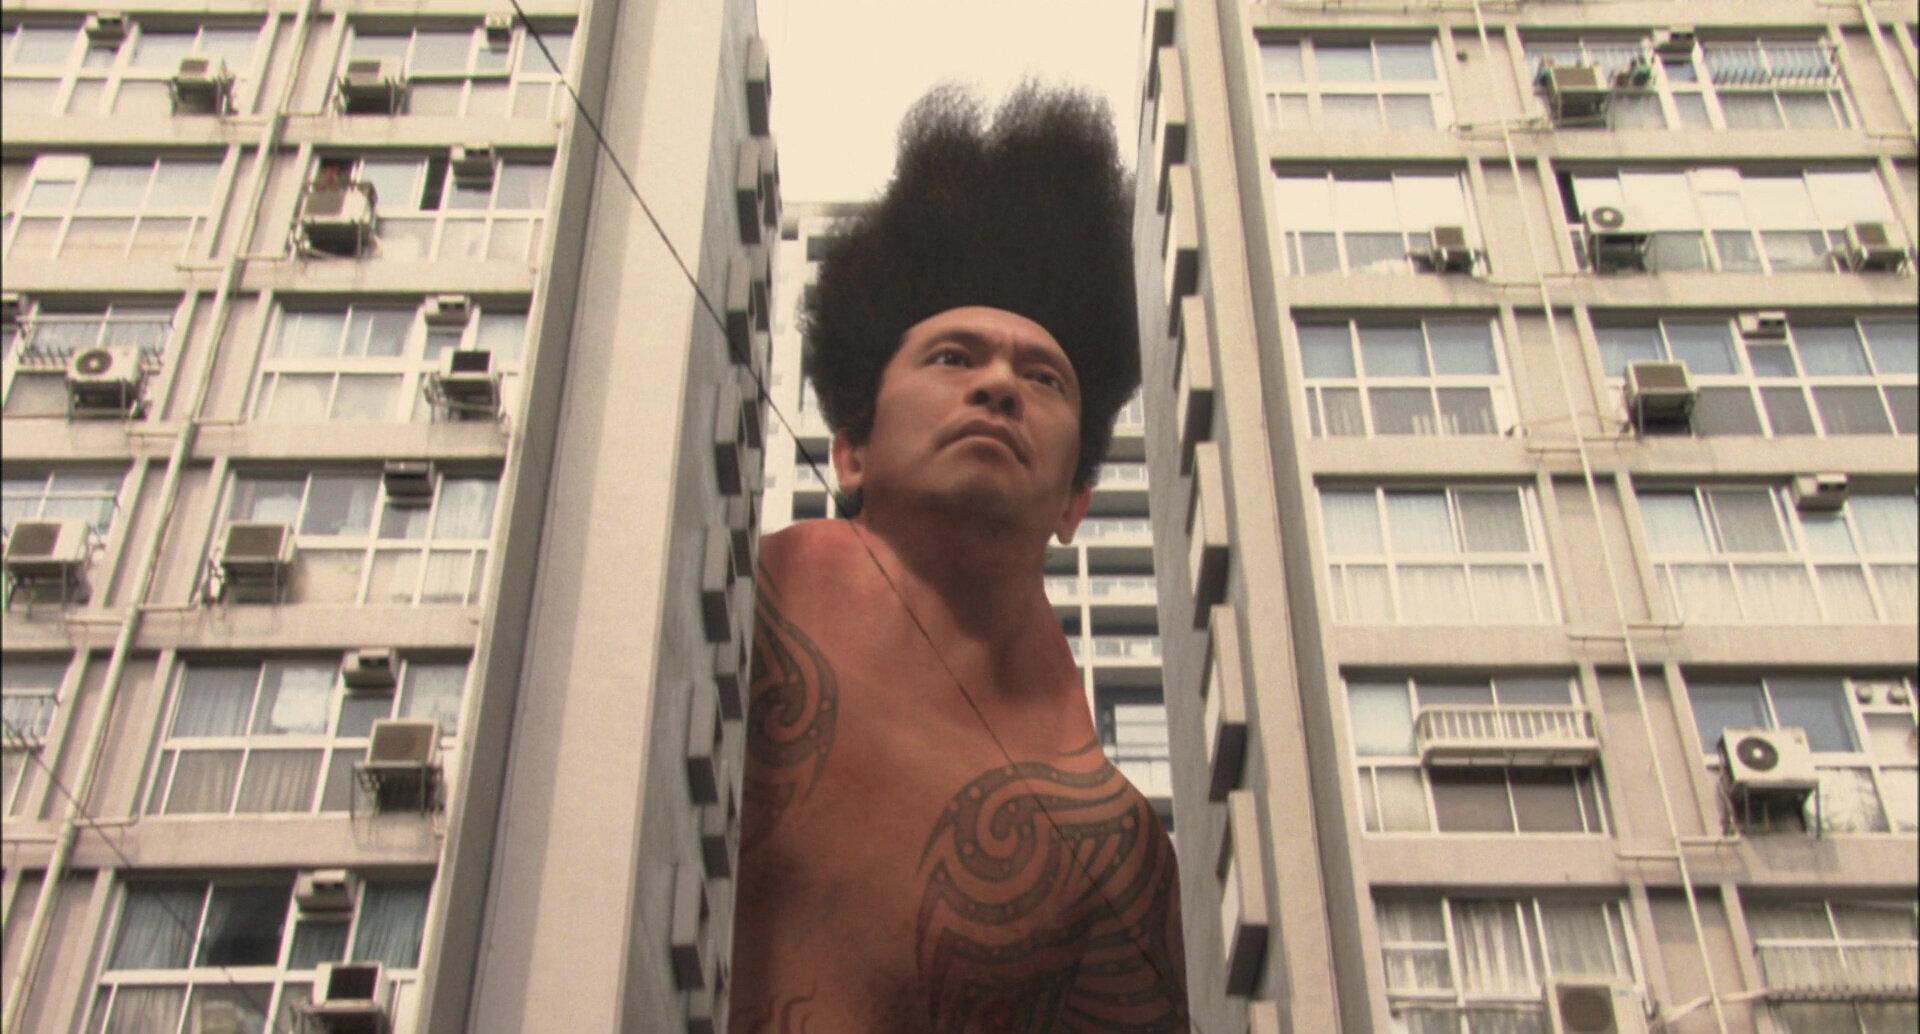 Featured image for Big Man Japan (2007) by Hiroshi Matsumoto